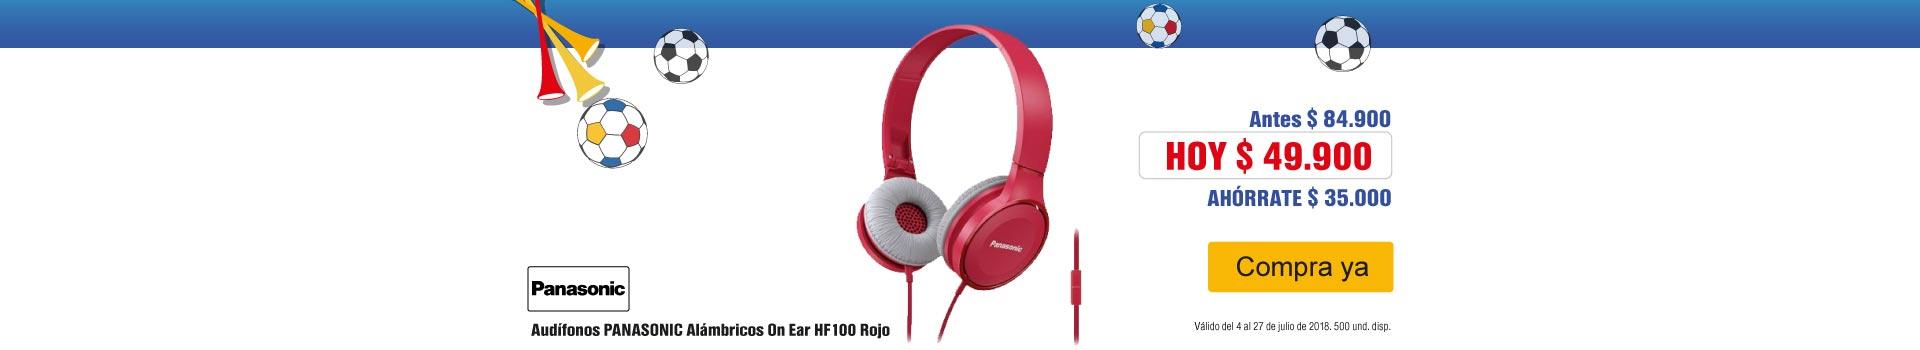 AK-KT-HIPER-14-accesorios-PP---panasonic-hf100-jul6